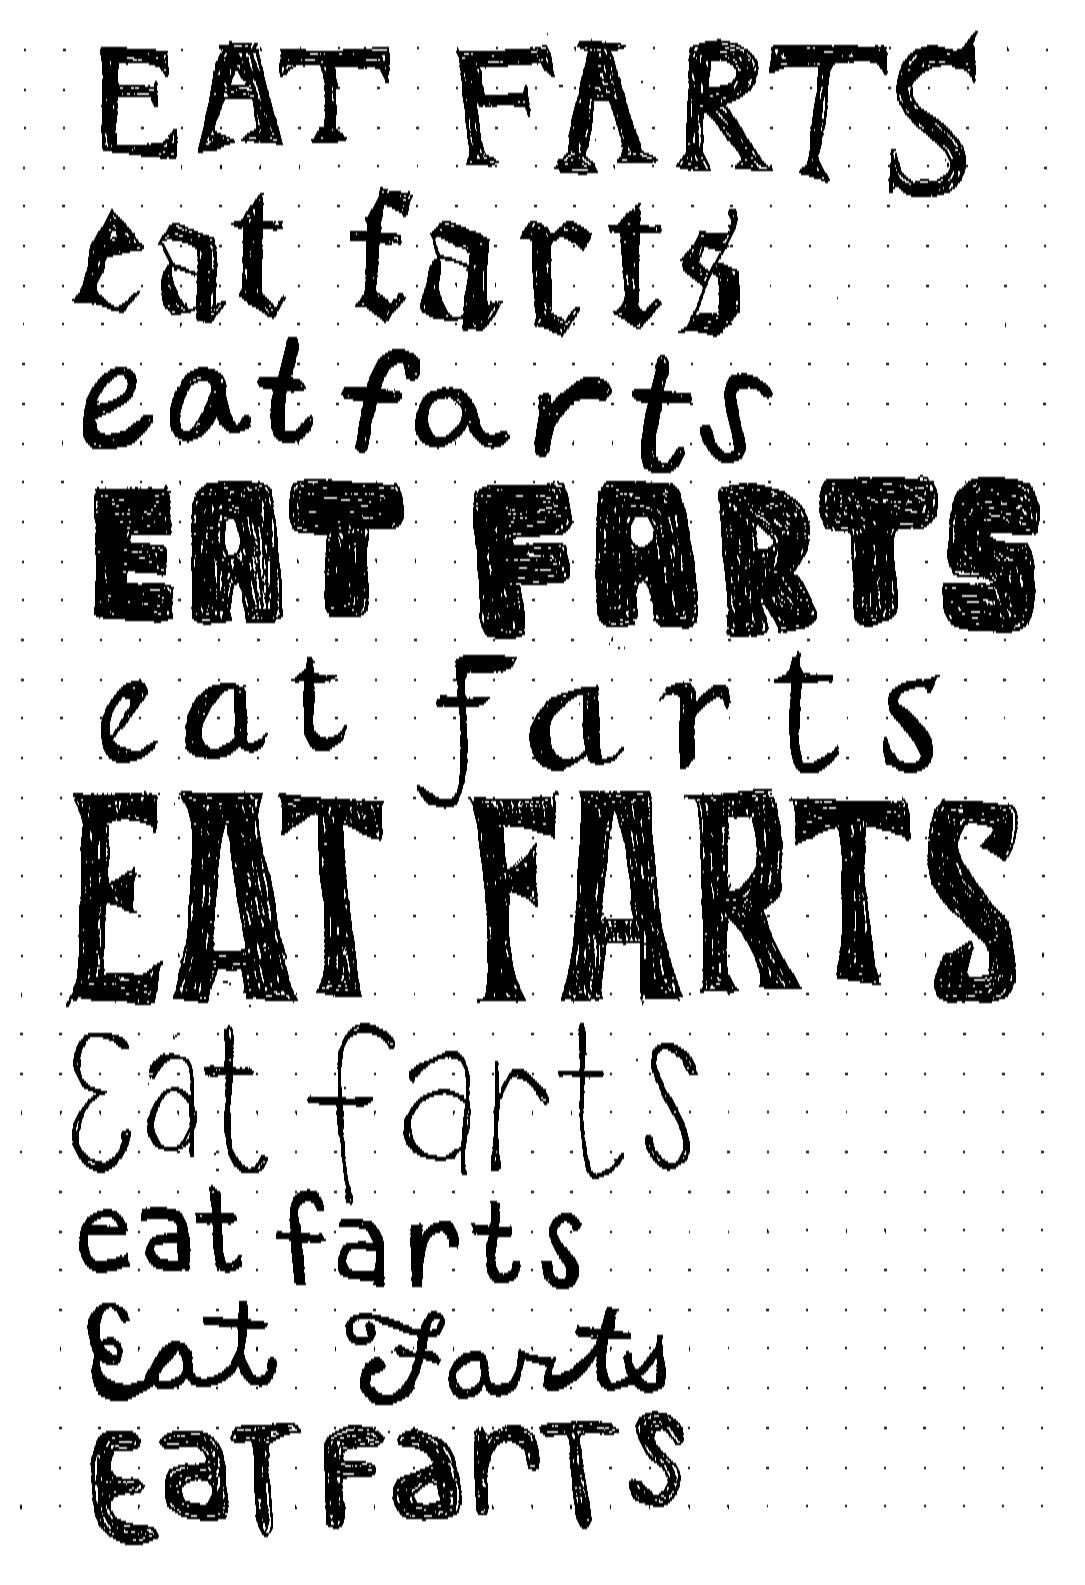 stretch goal eat farts print